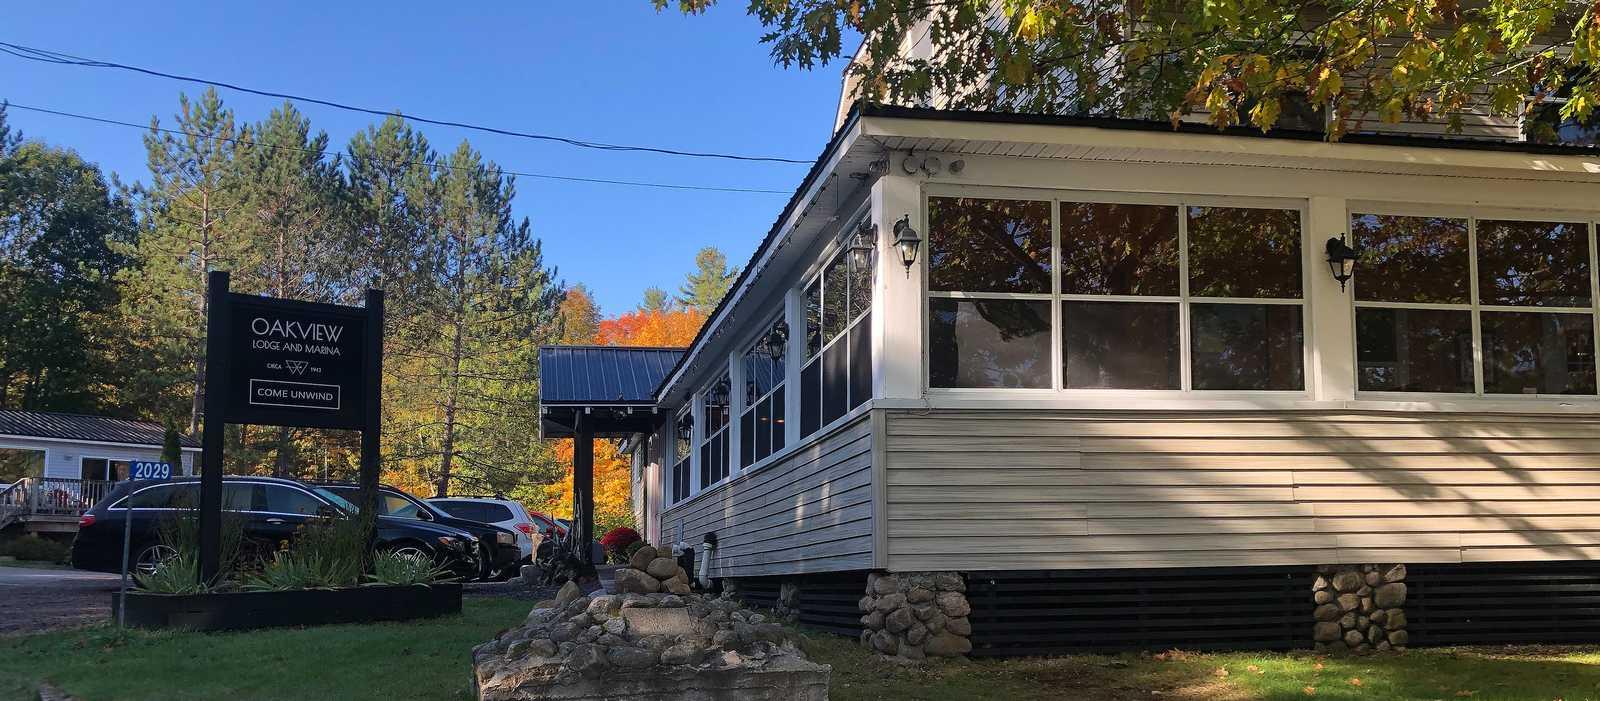 Oakview Lodge & Marina im Herbst